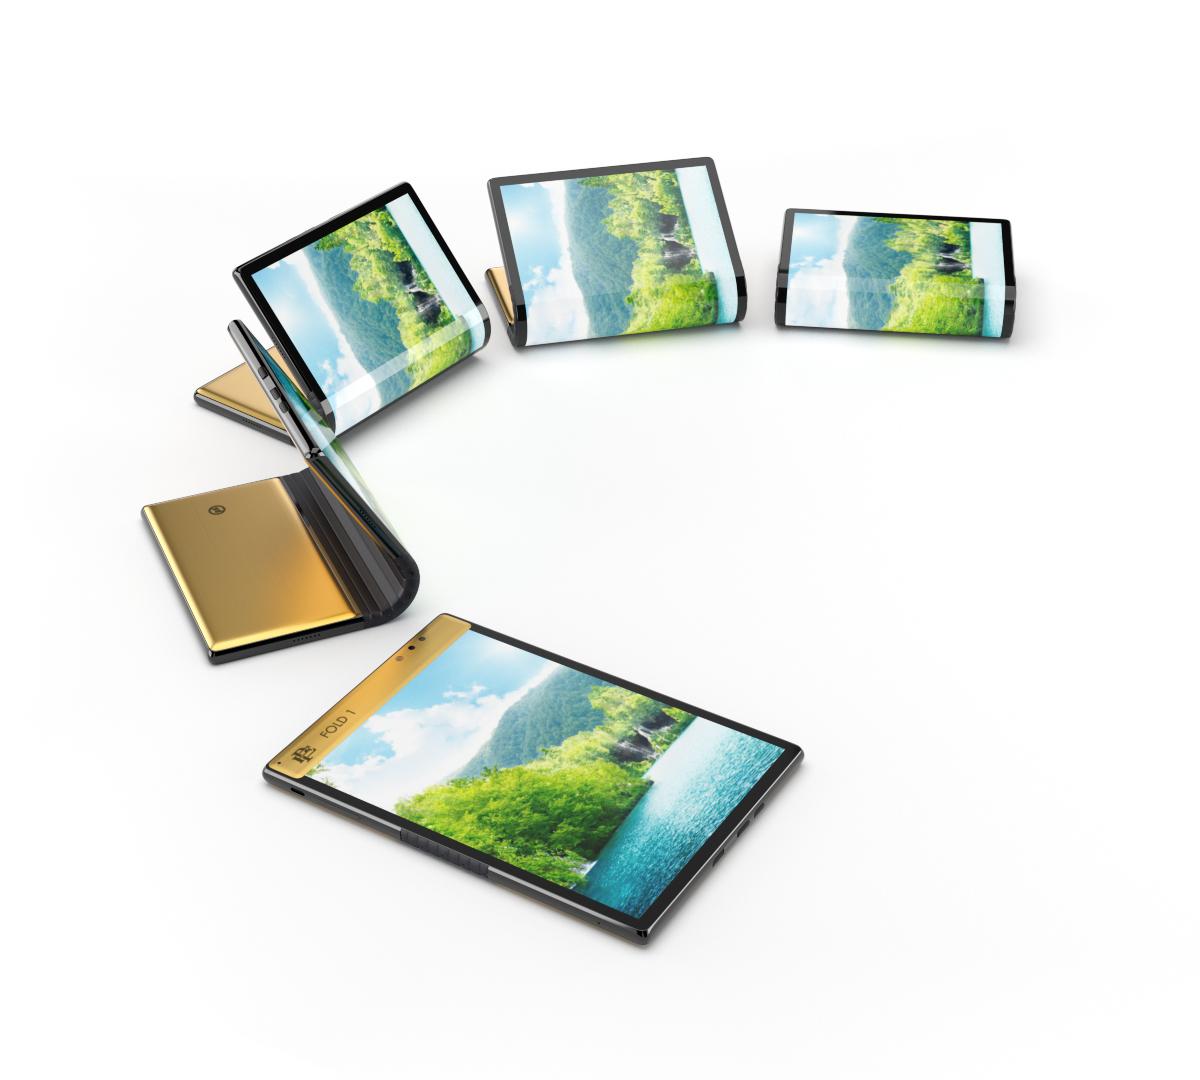 Escobar Fold 1 Foldable Phone - Folding into a Tablet